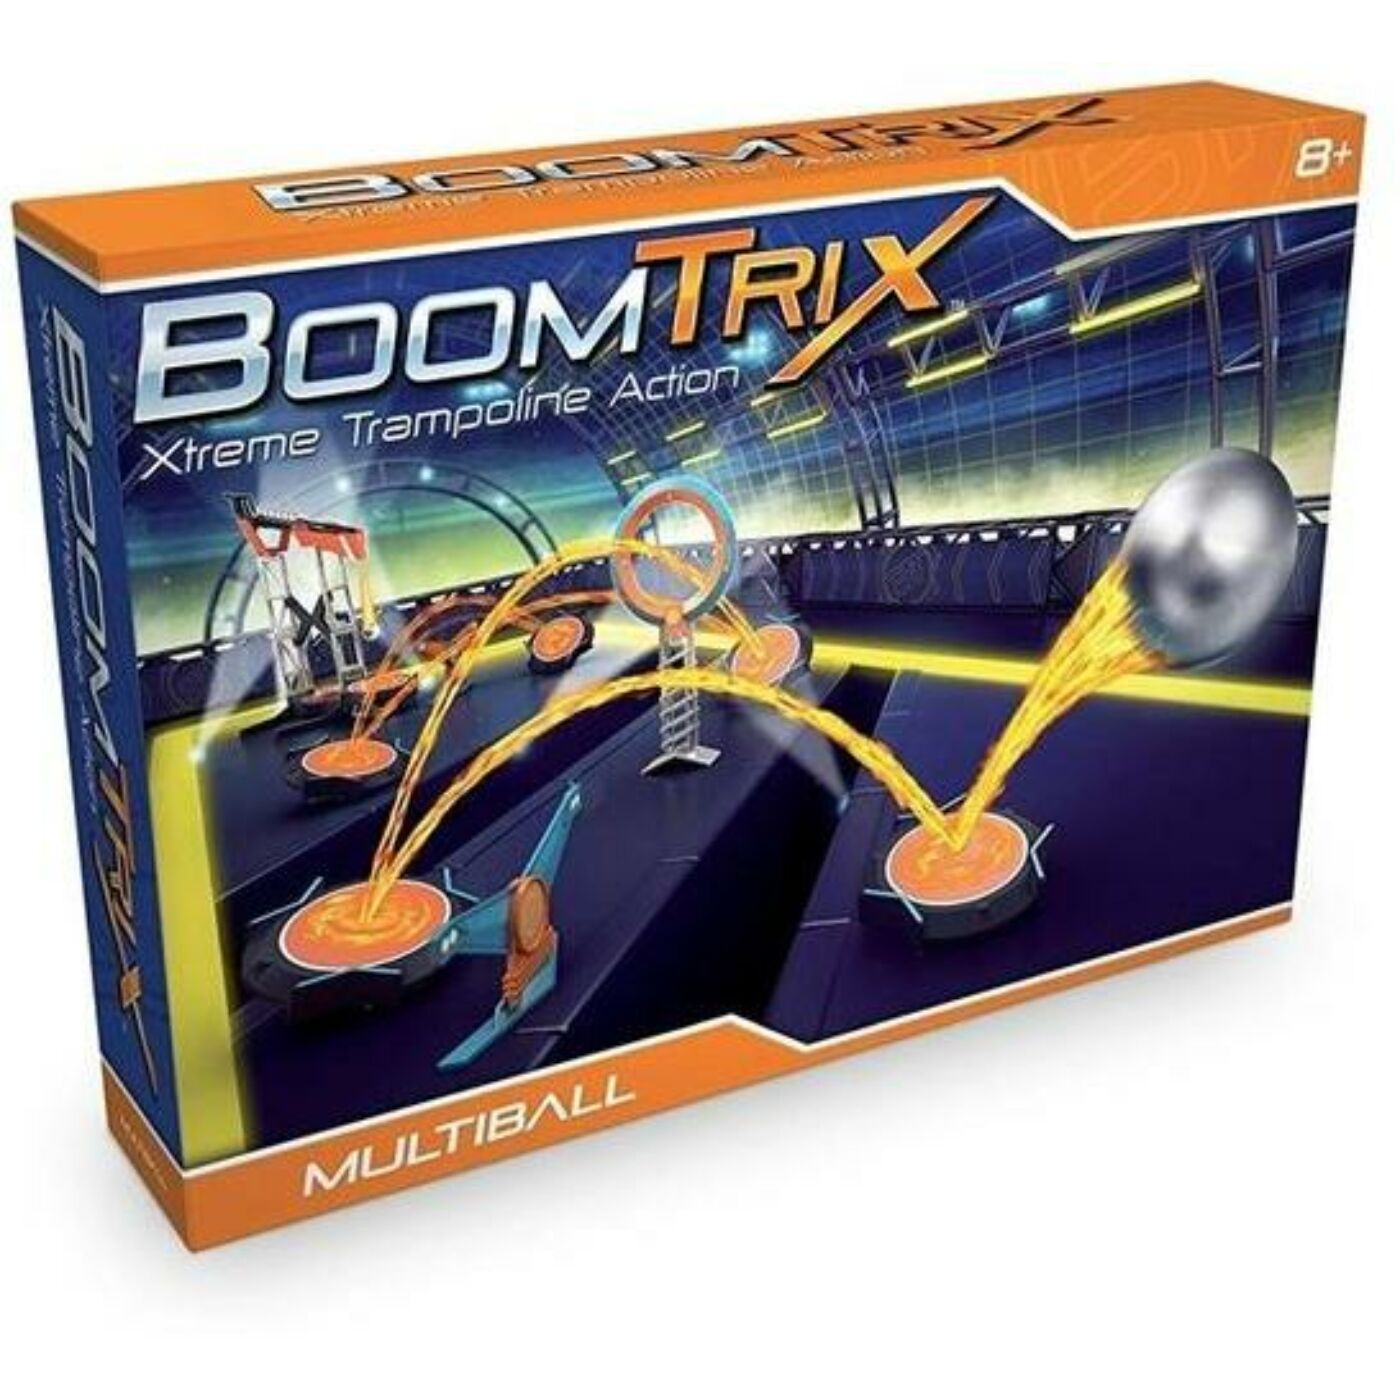 Boomtrix Multiball szett